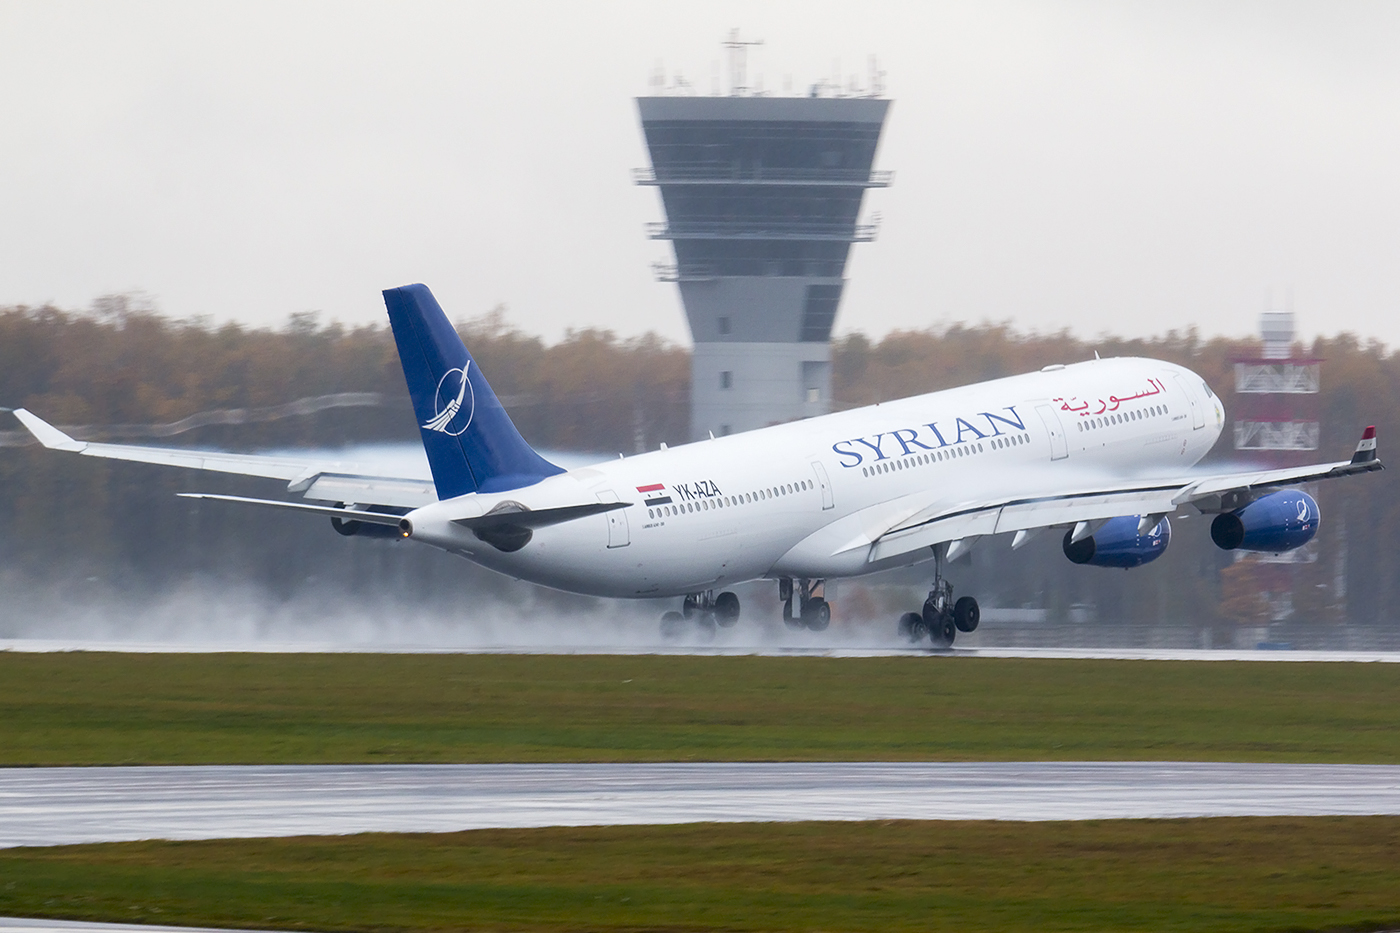 Plane belonging to the Syrian Airlines (FLICKR / TEREKHOV DMITRY)